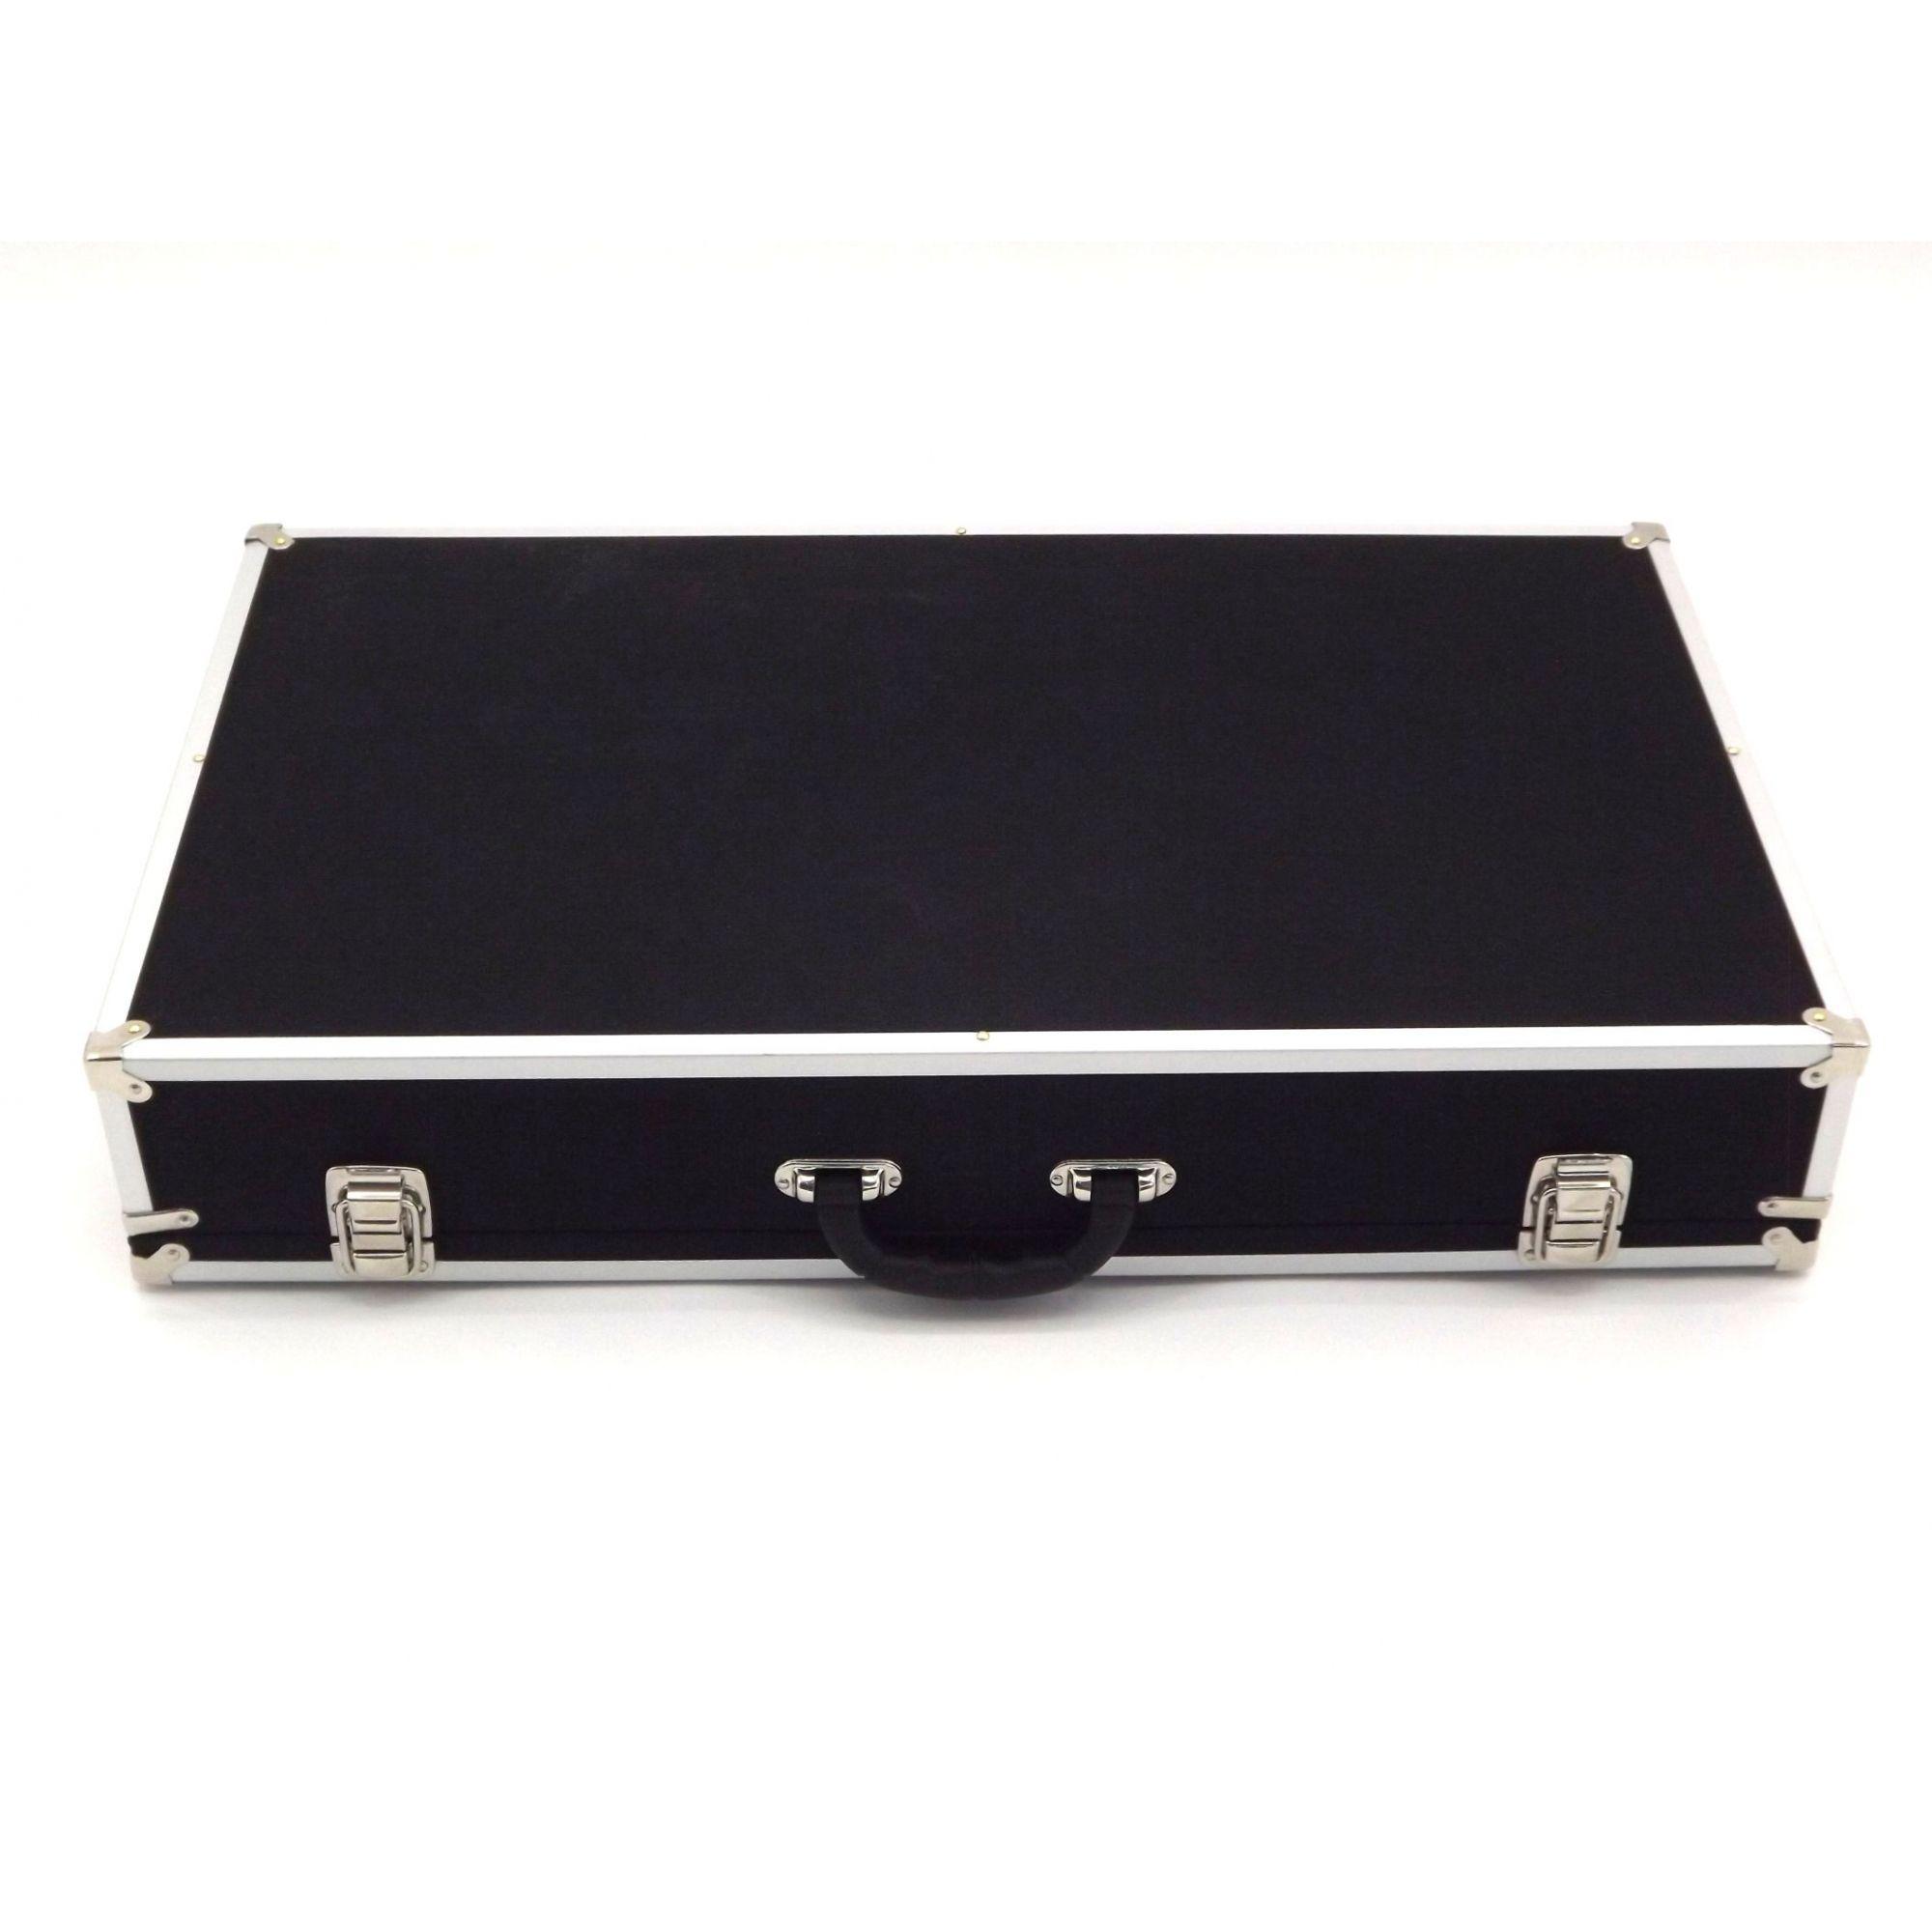 Case Pedais Pedaleira 50x35x15cm Super Luxo